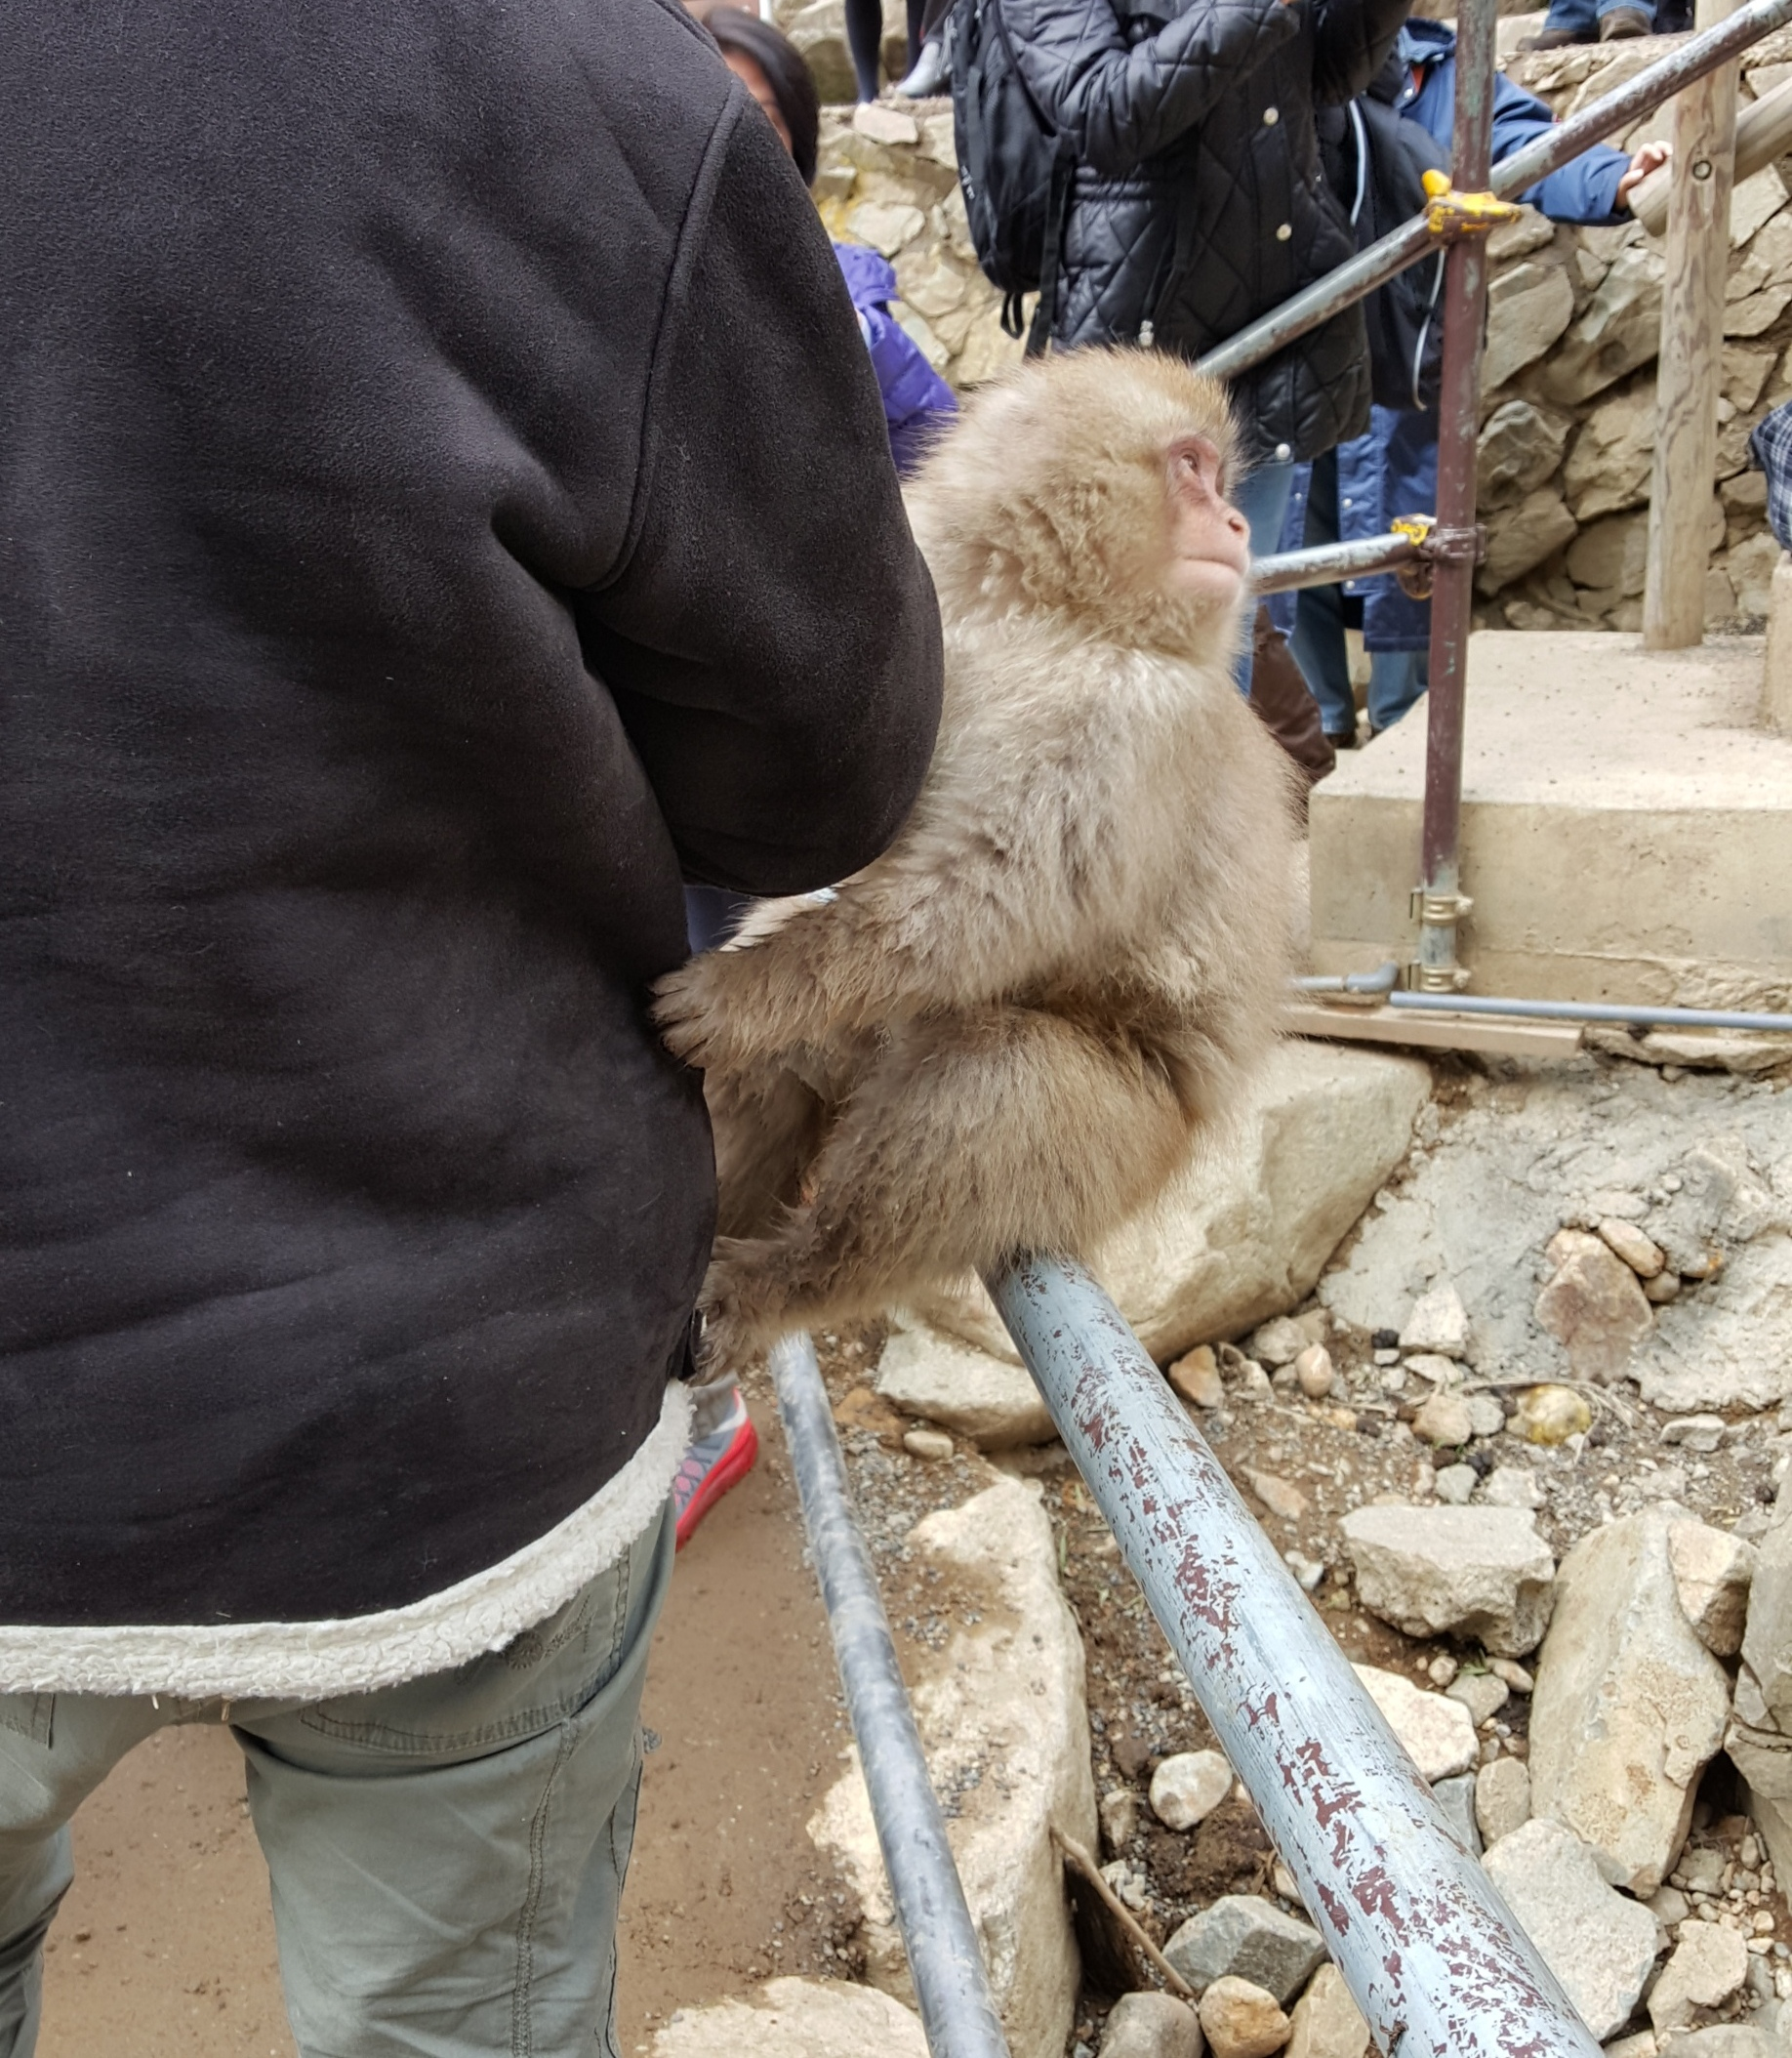 Monkey grab.jpg